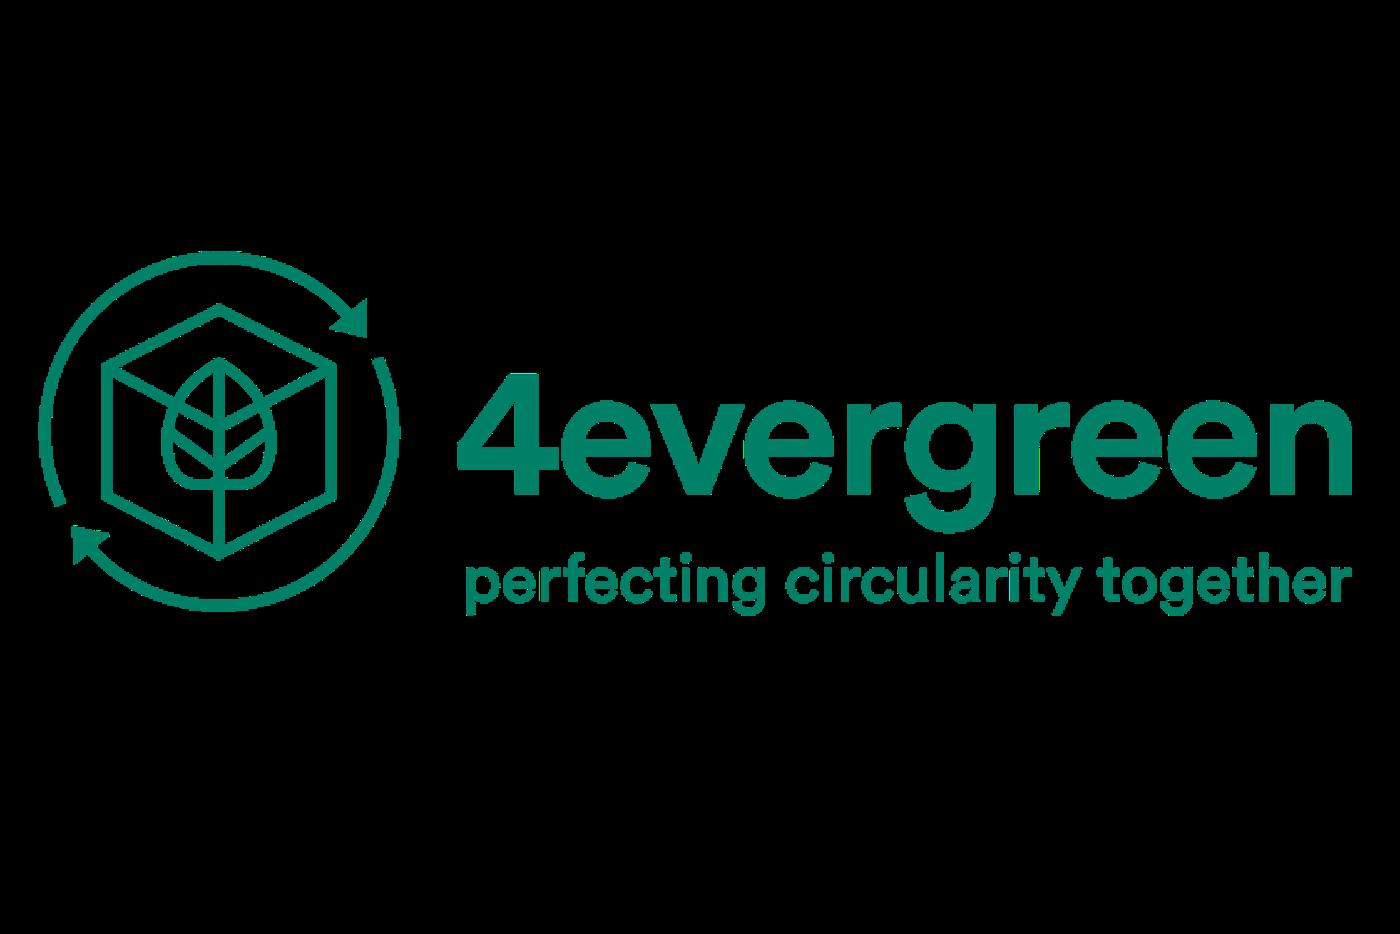 20210929_4EG_logo_tagline_green